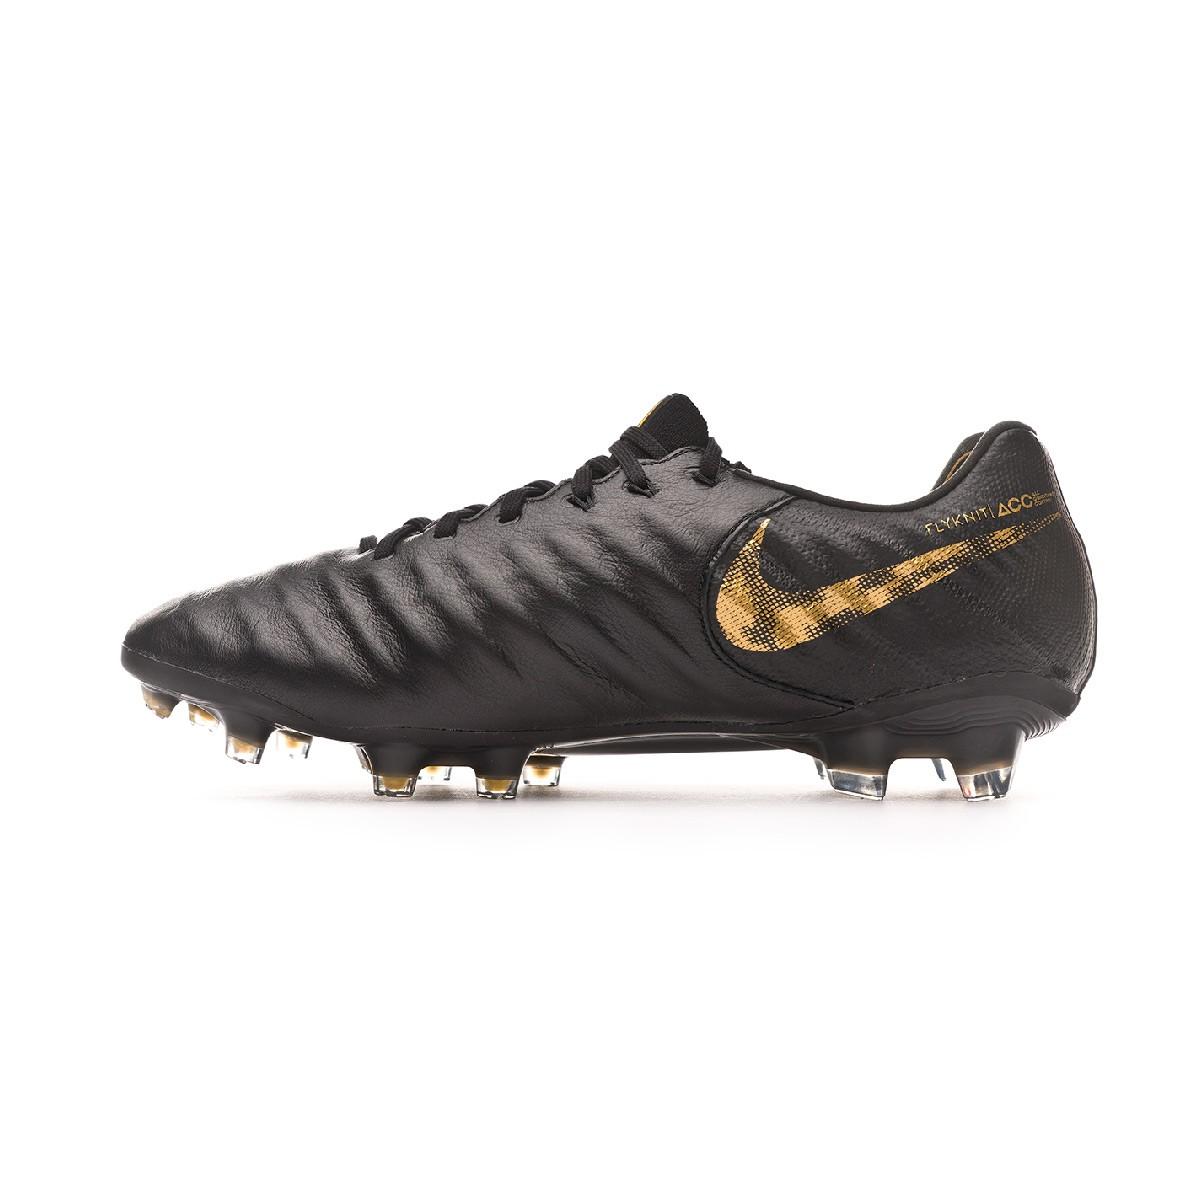 2331a24f50ca Football Boots Nike Tiempo Legend VII Elite FG Black-Metallic vivid gold - Tienda  de fútbol Fútbol Emotion